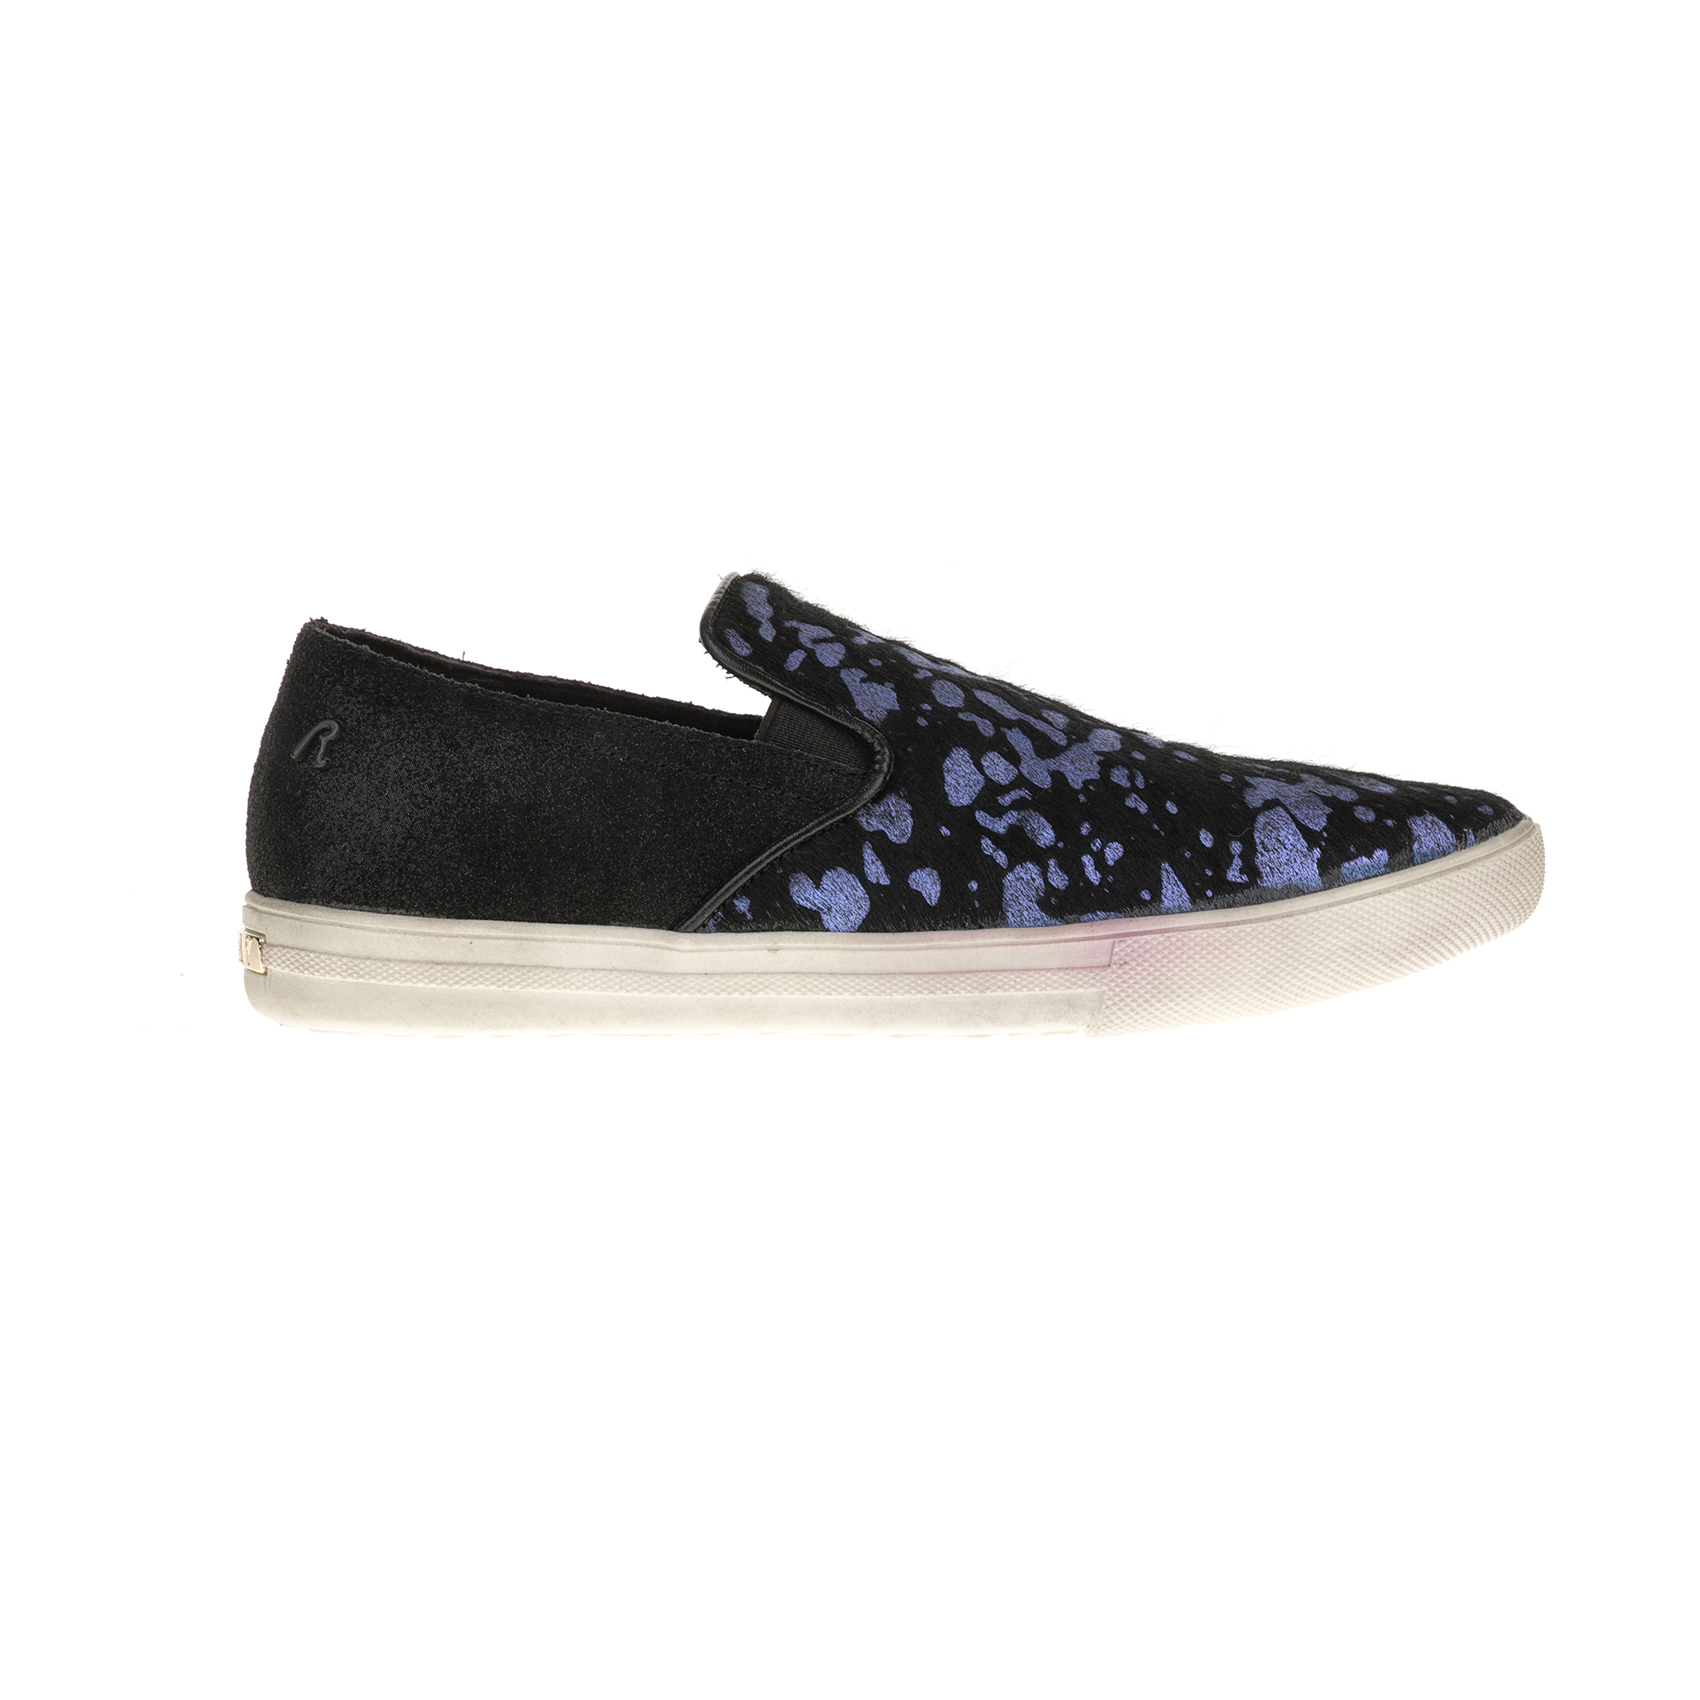 REPLAY – Γυναικεία παπούτσια REPLAY μαύρα